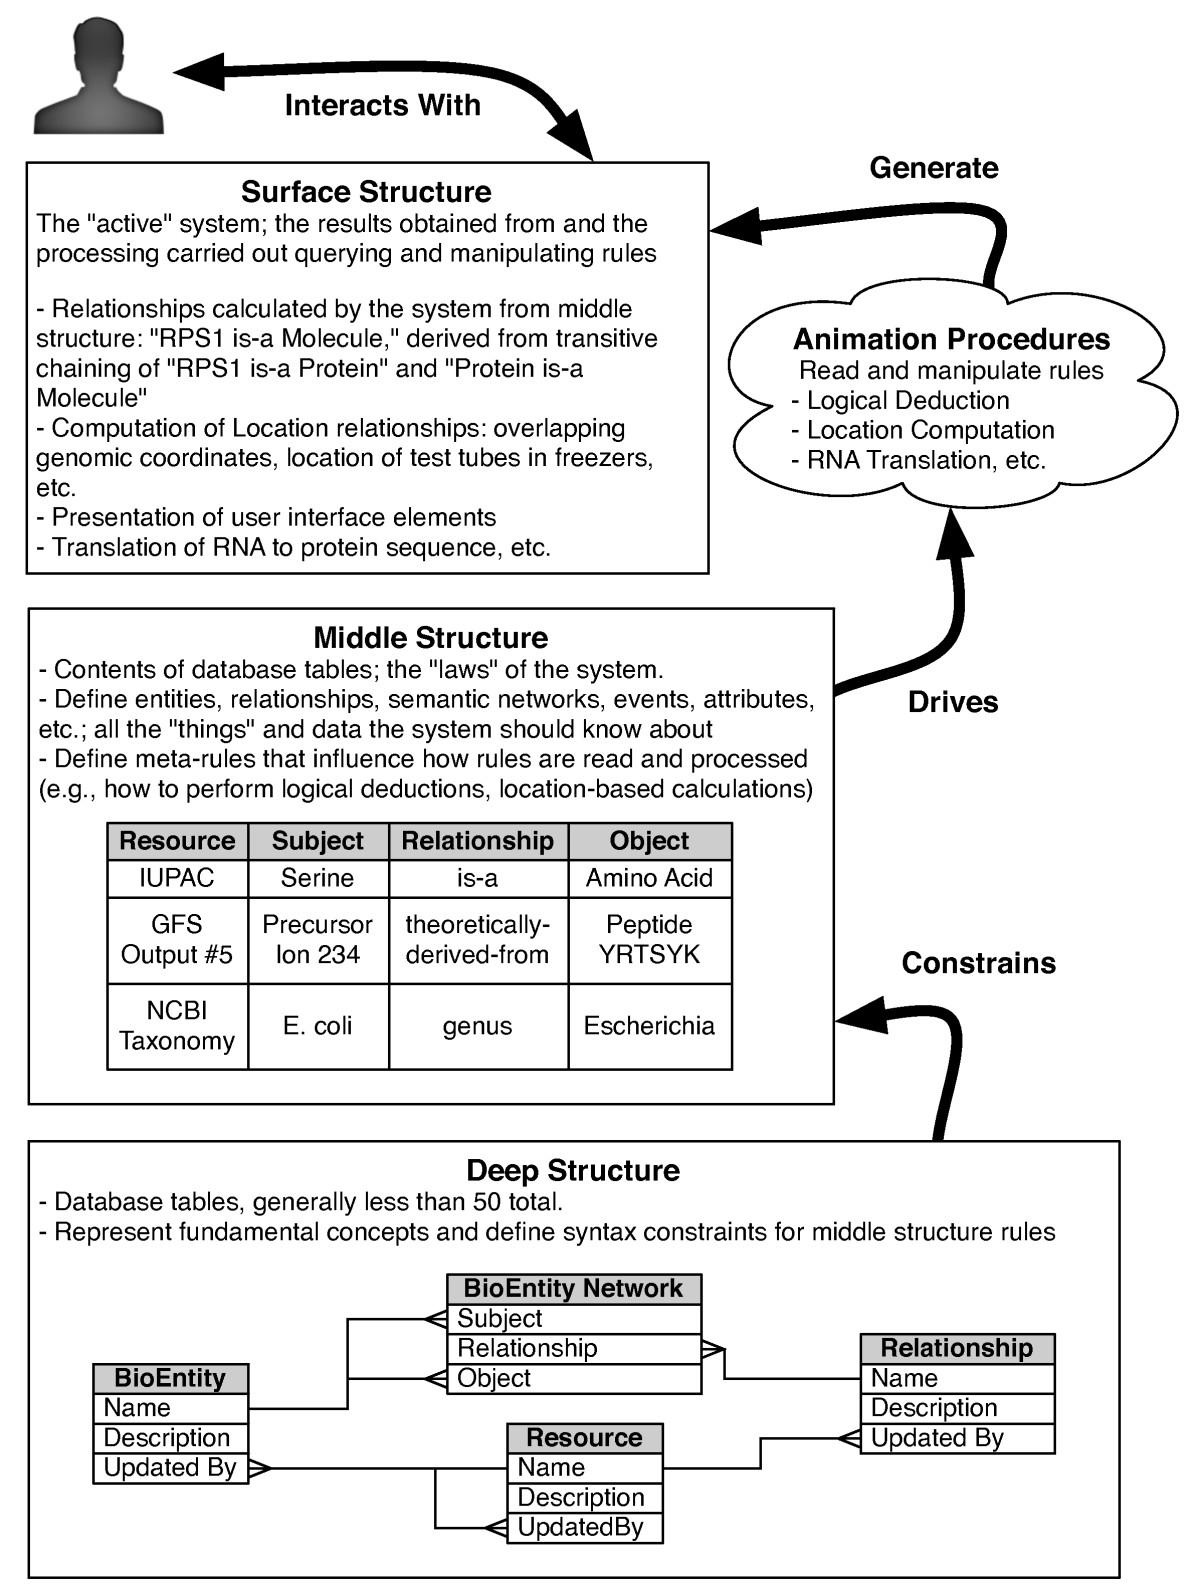 Ultra-Structure database design methodology for managing